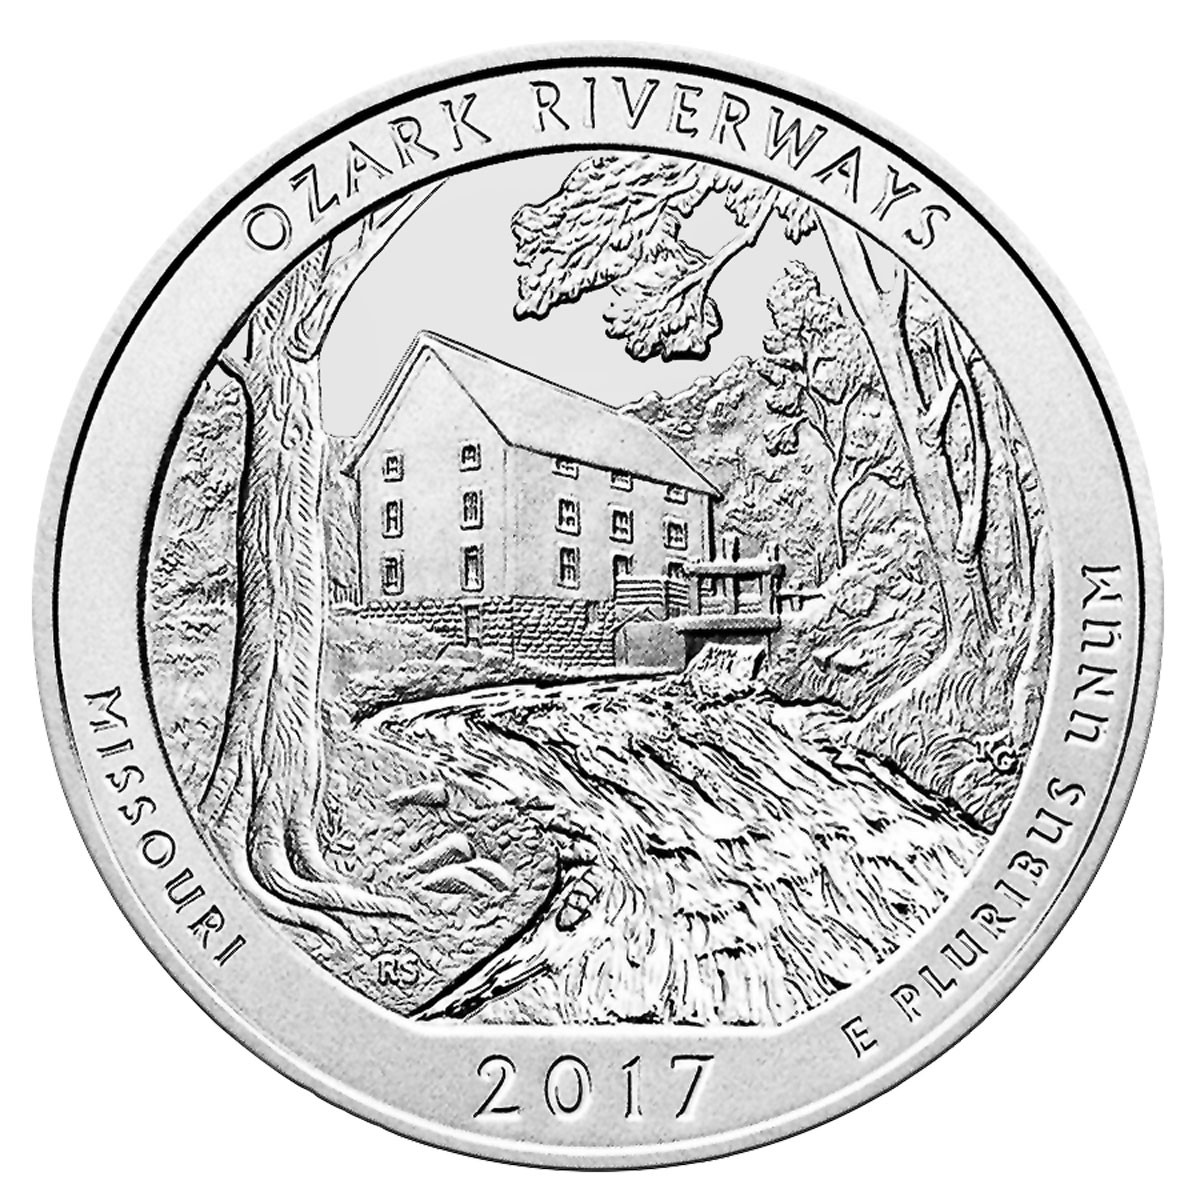 Buy 2017 Ozark Riverways 5 Oz Silver Atb Coin